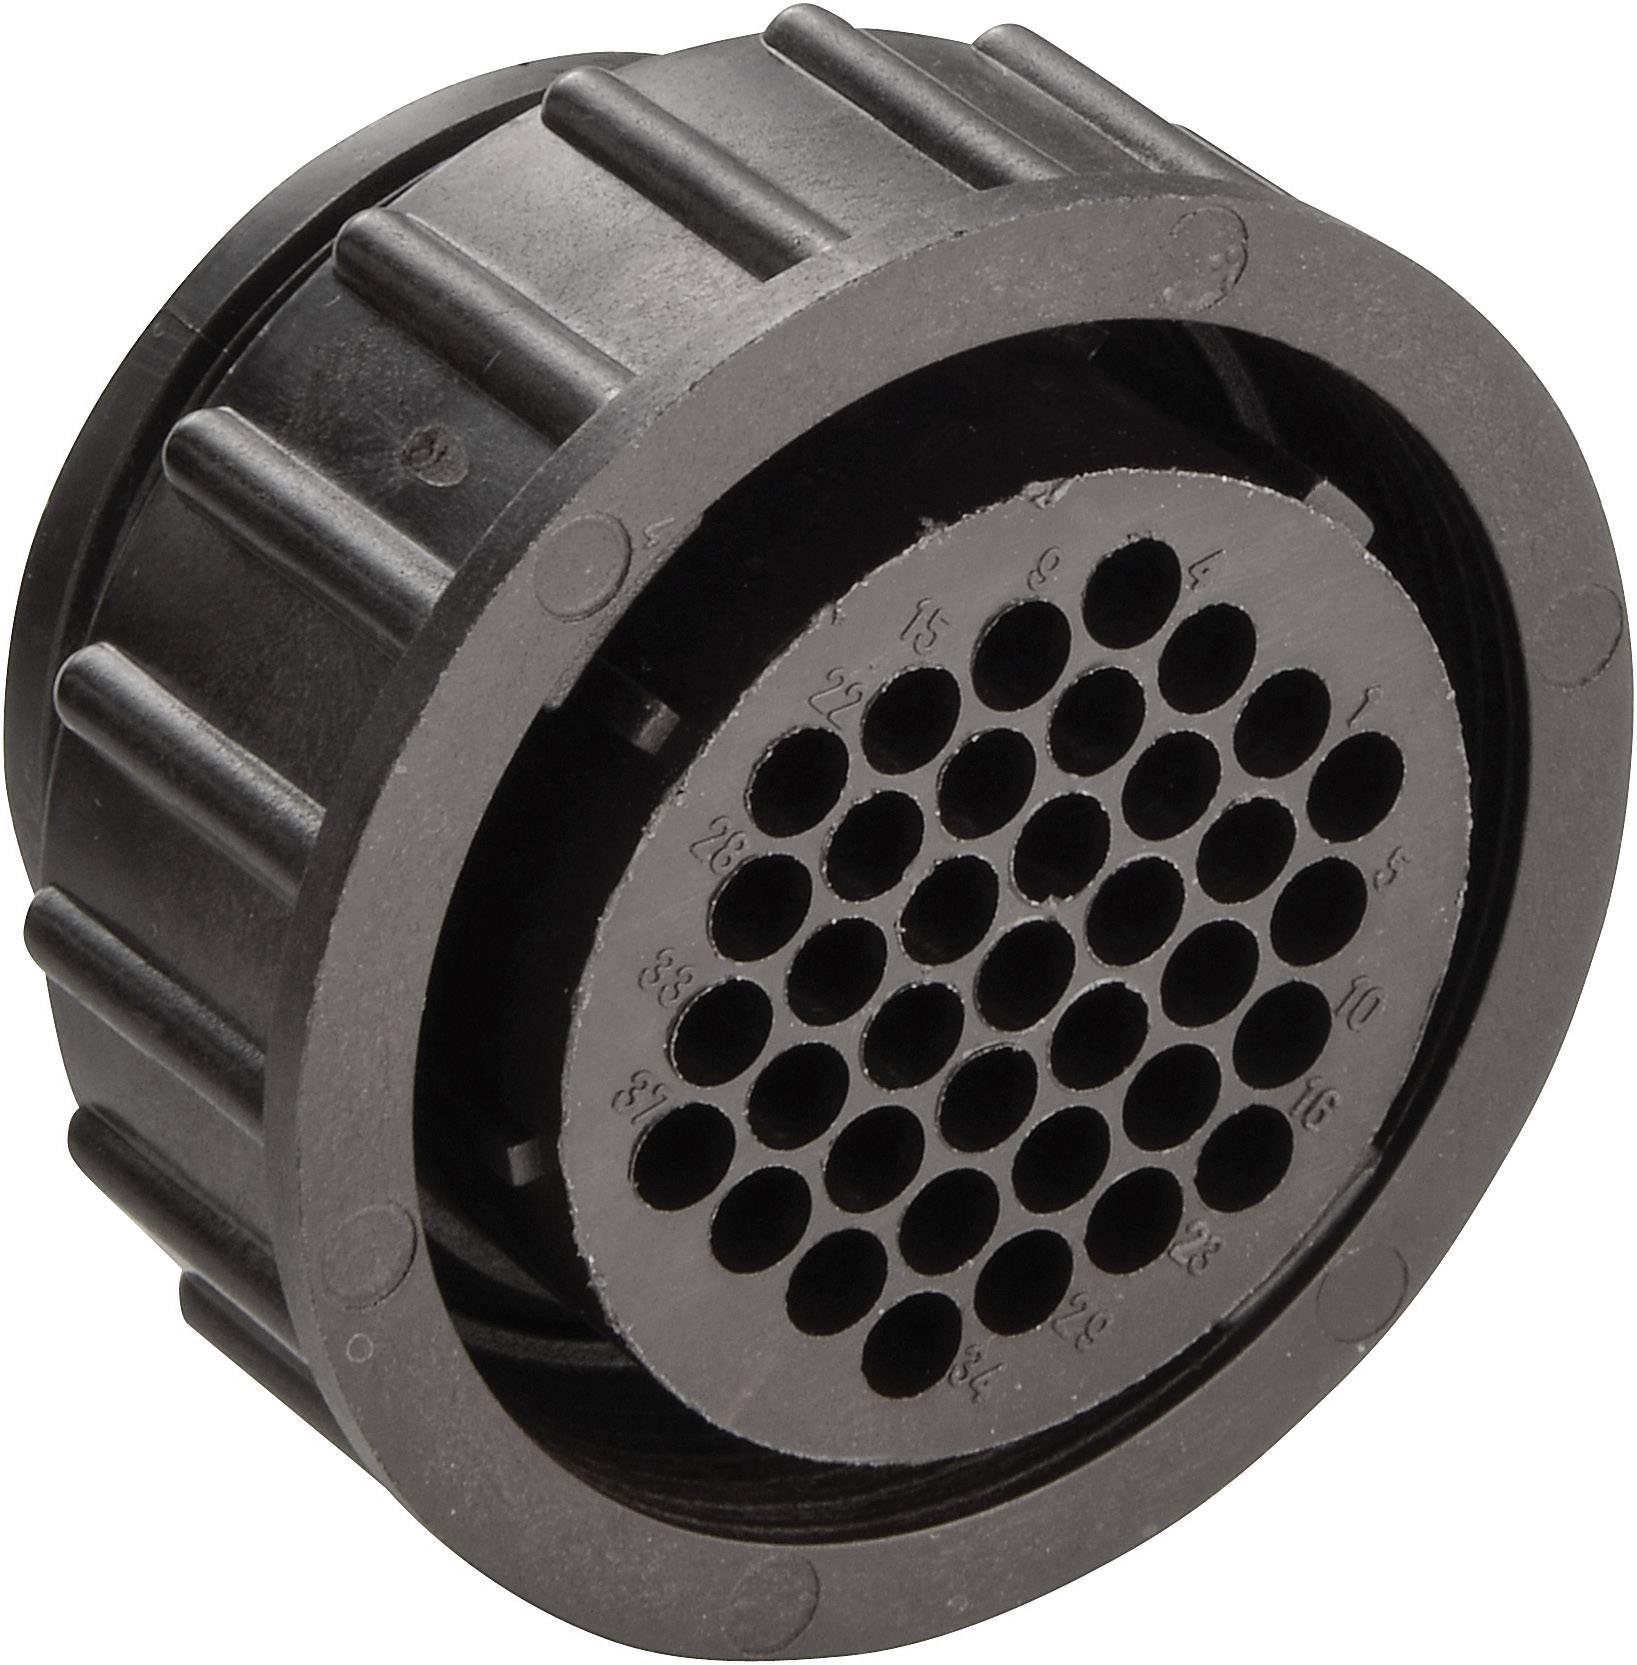 Kulatý konektor TE Connectivity, 182923-1, 37pólový